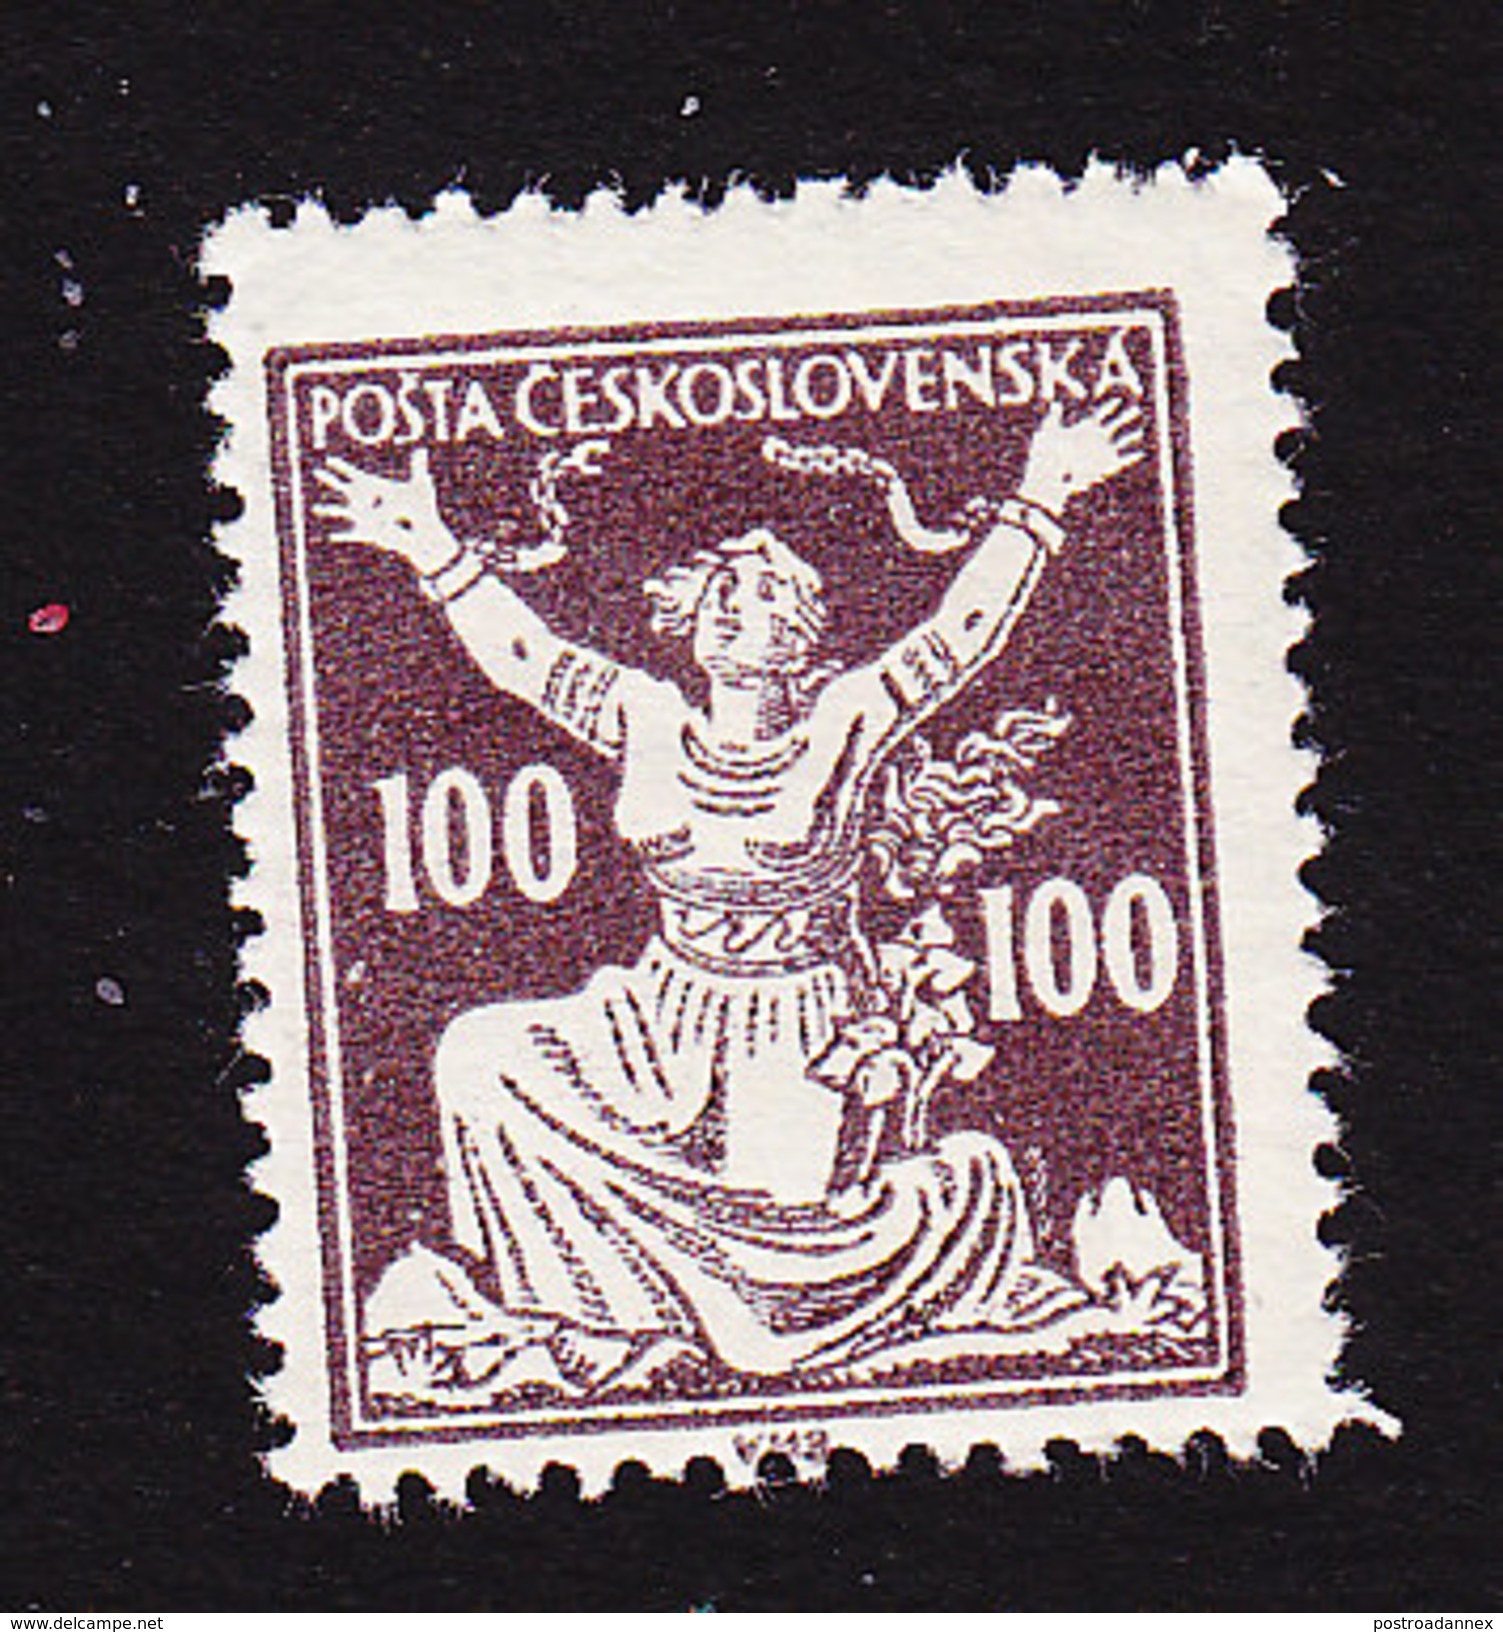 Czechoslovakia, Scott #88, Mint Hinged, Czechoslovakia Breaking Chains, Issued 1920 - Czechoslovakia